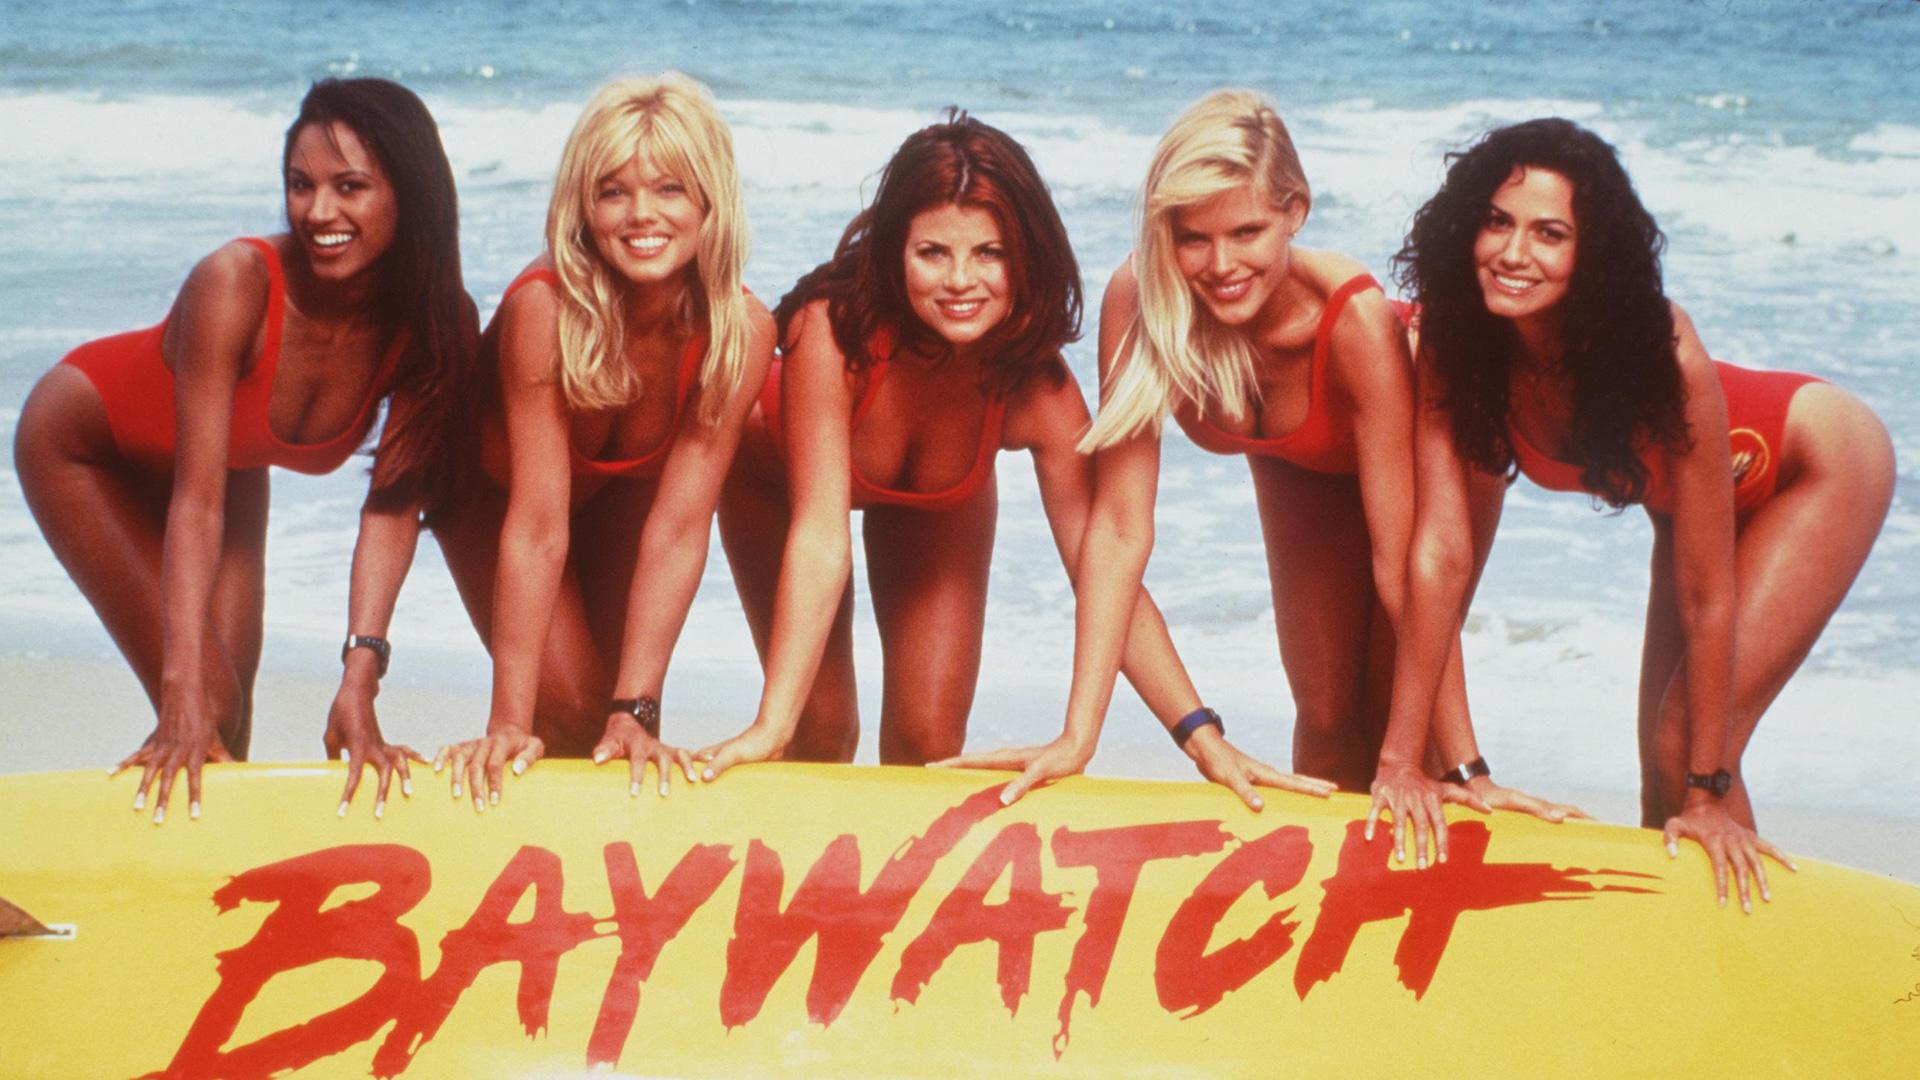 Cast of Baywatch